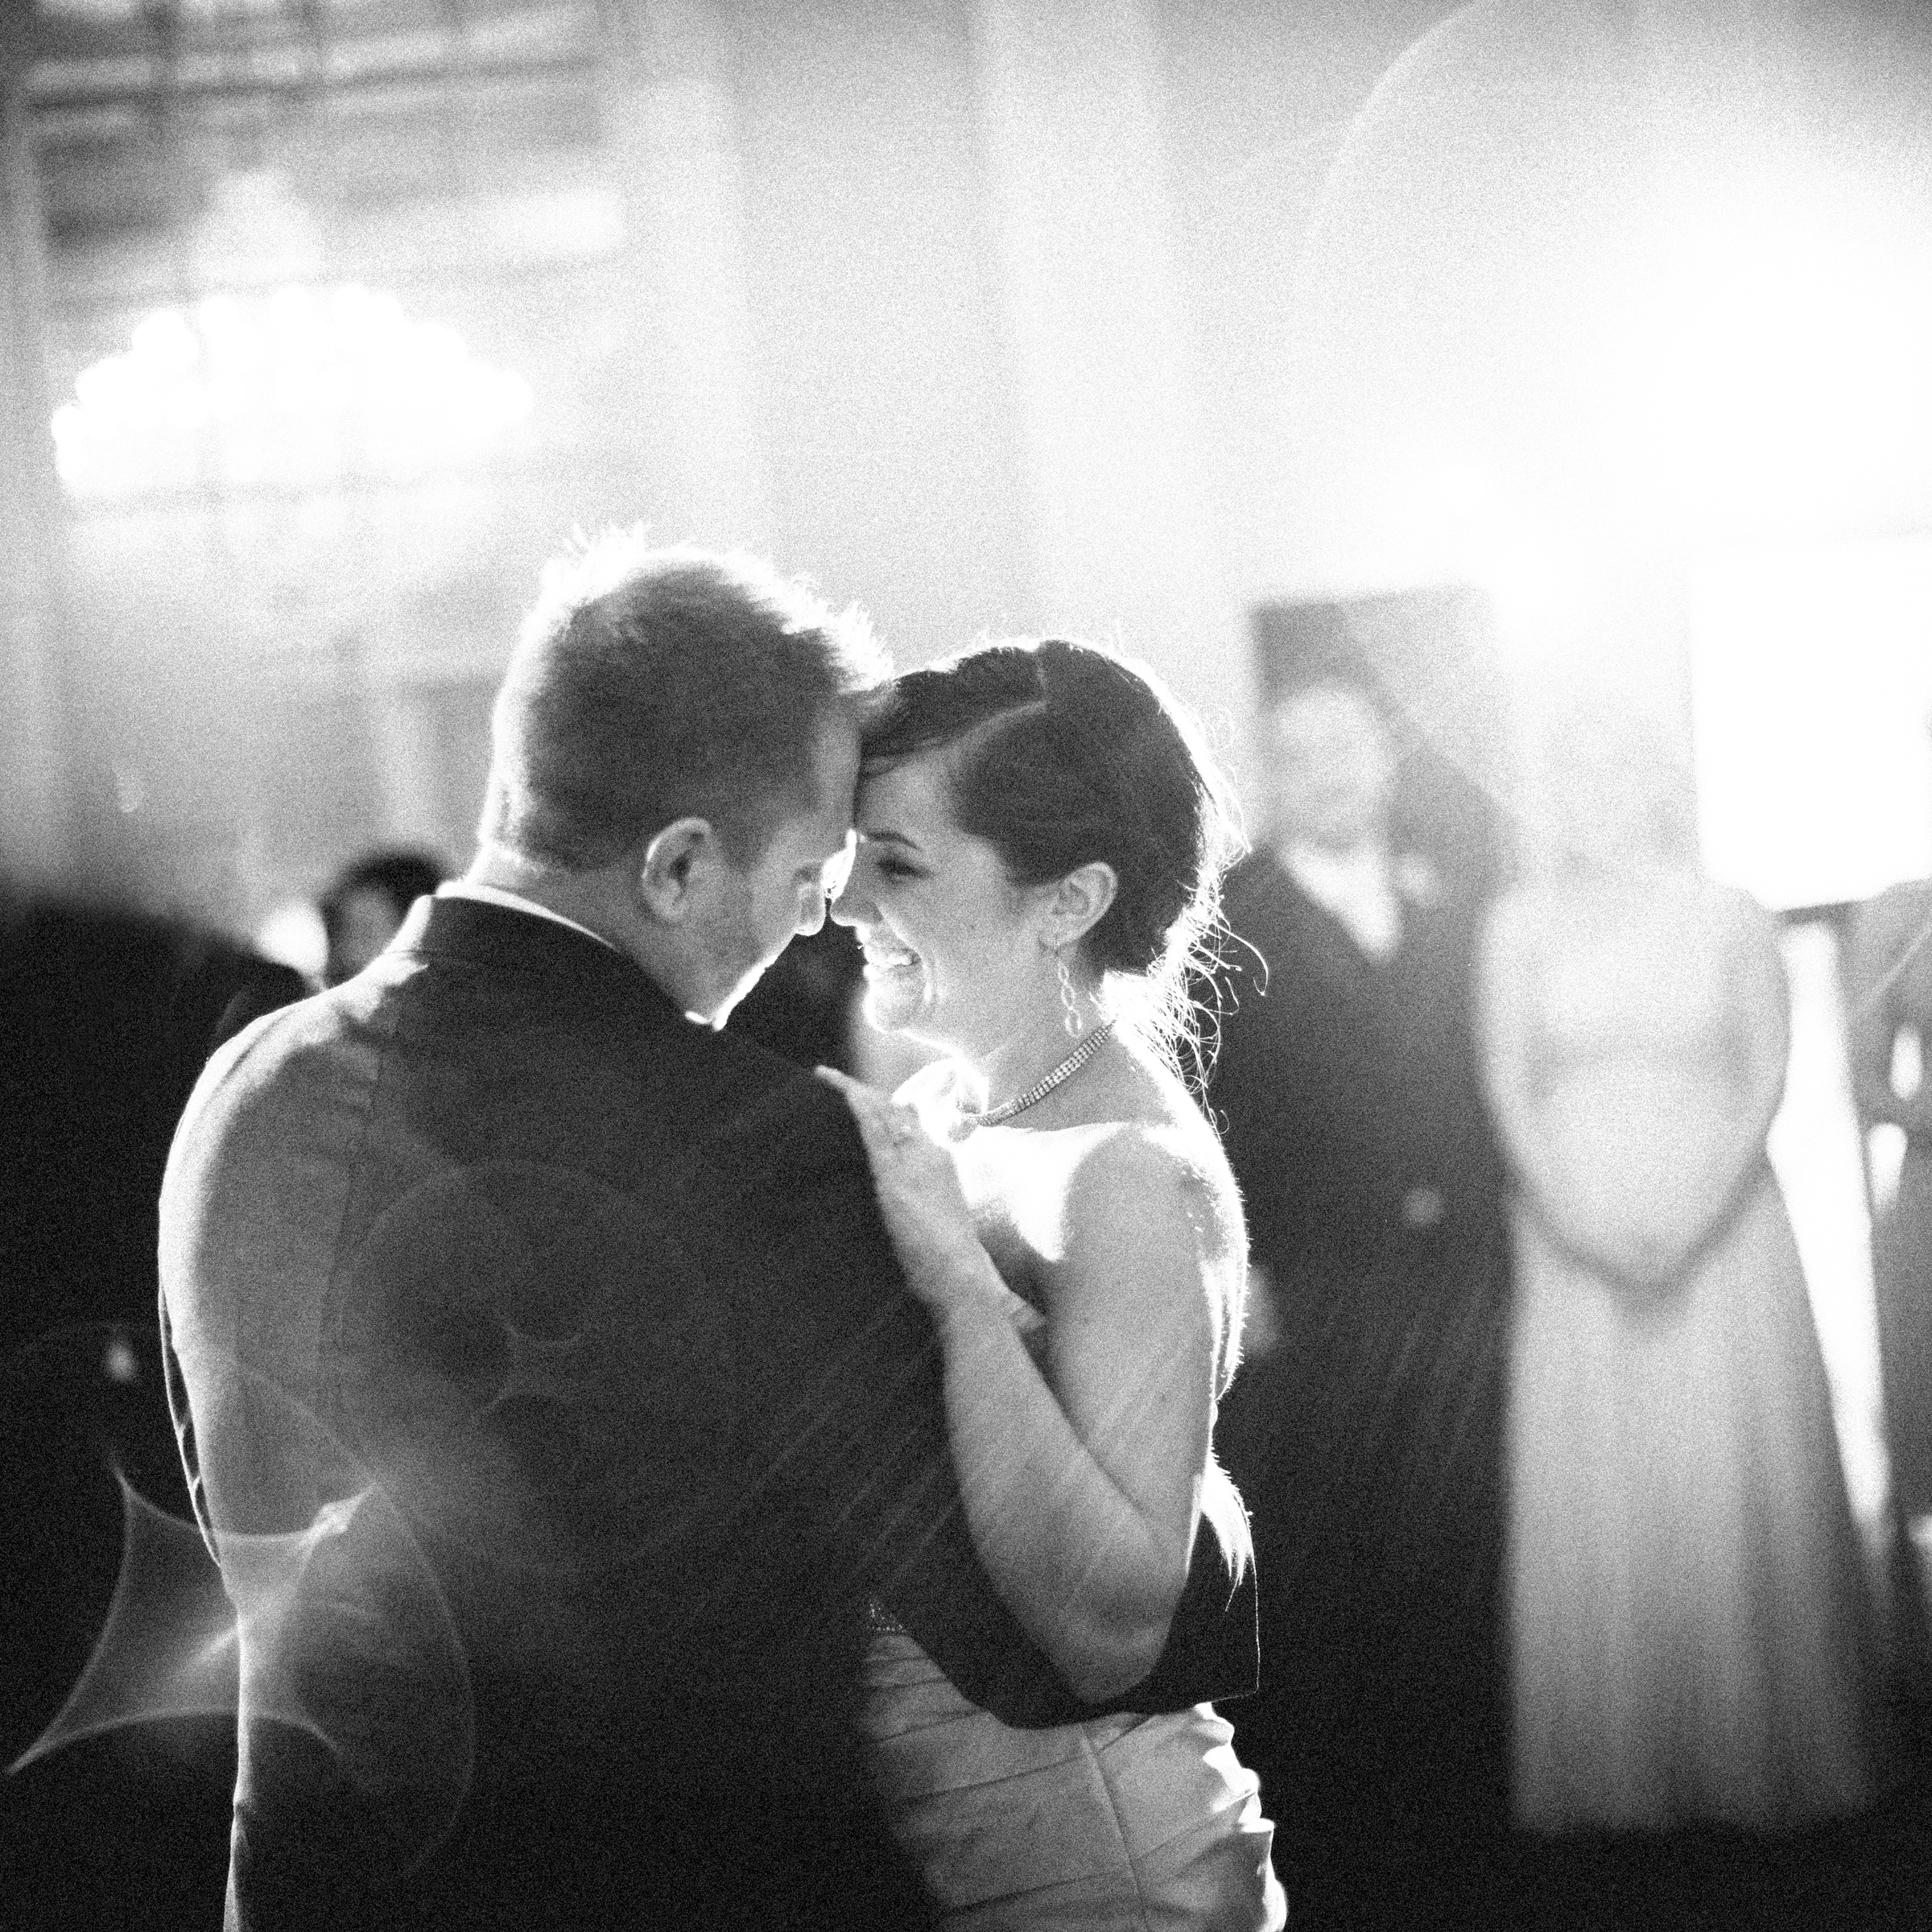 nj-monmouth-asbury-park-wedding-photographer-KEEP_JK0575.jpg